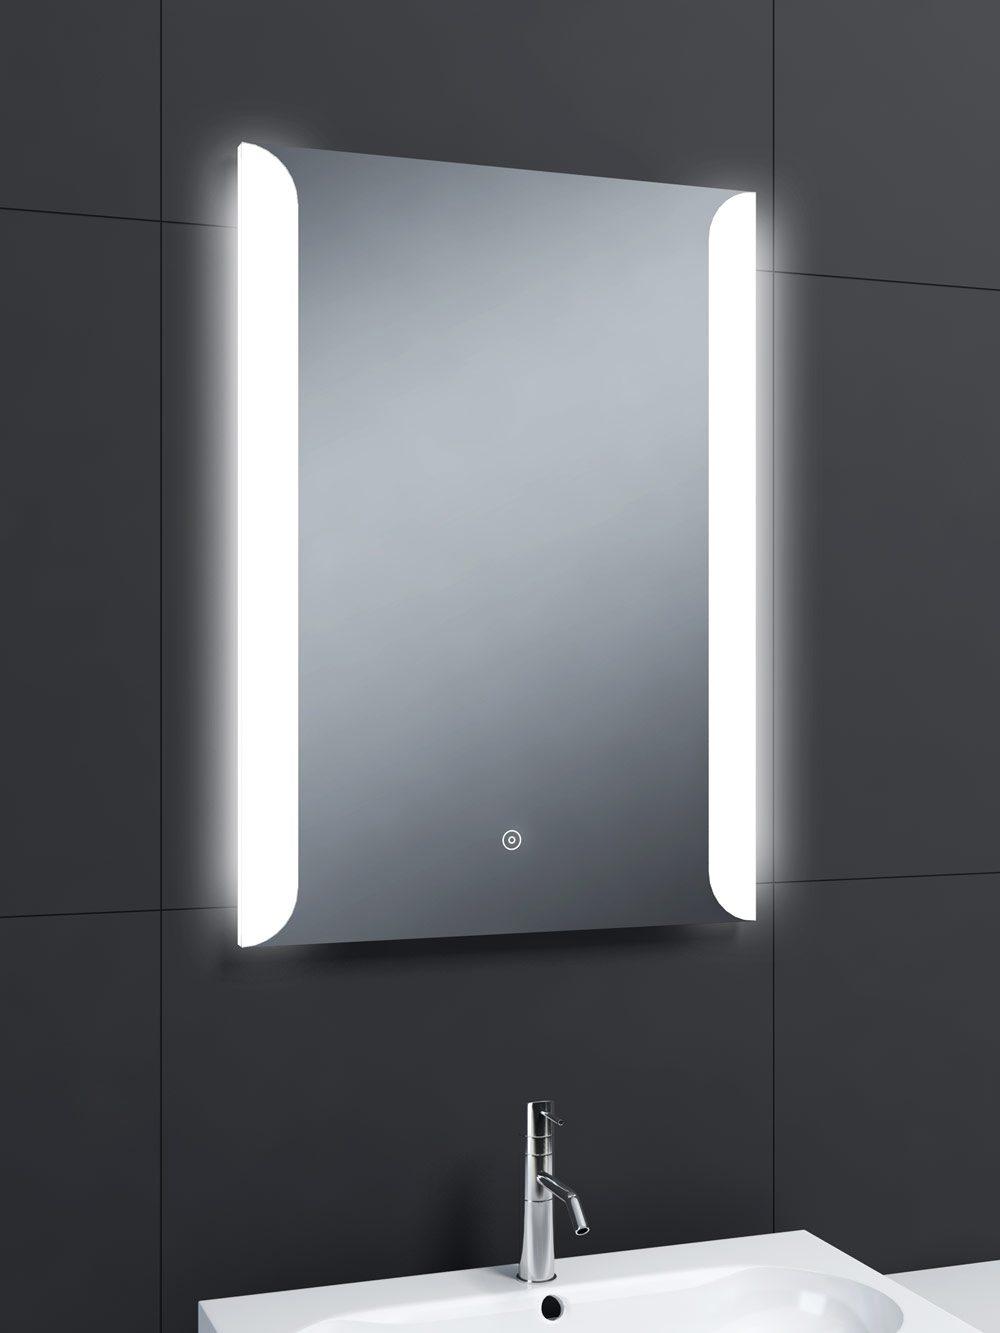 Cruise Live Mirror Btw Baths Tiles Woodfloors